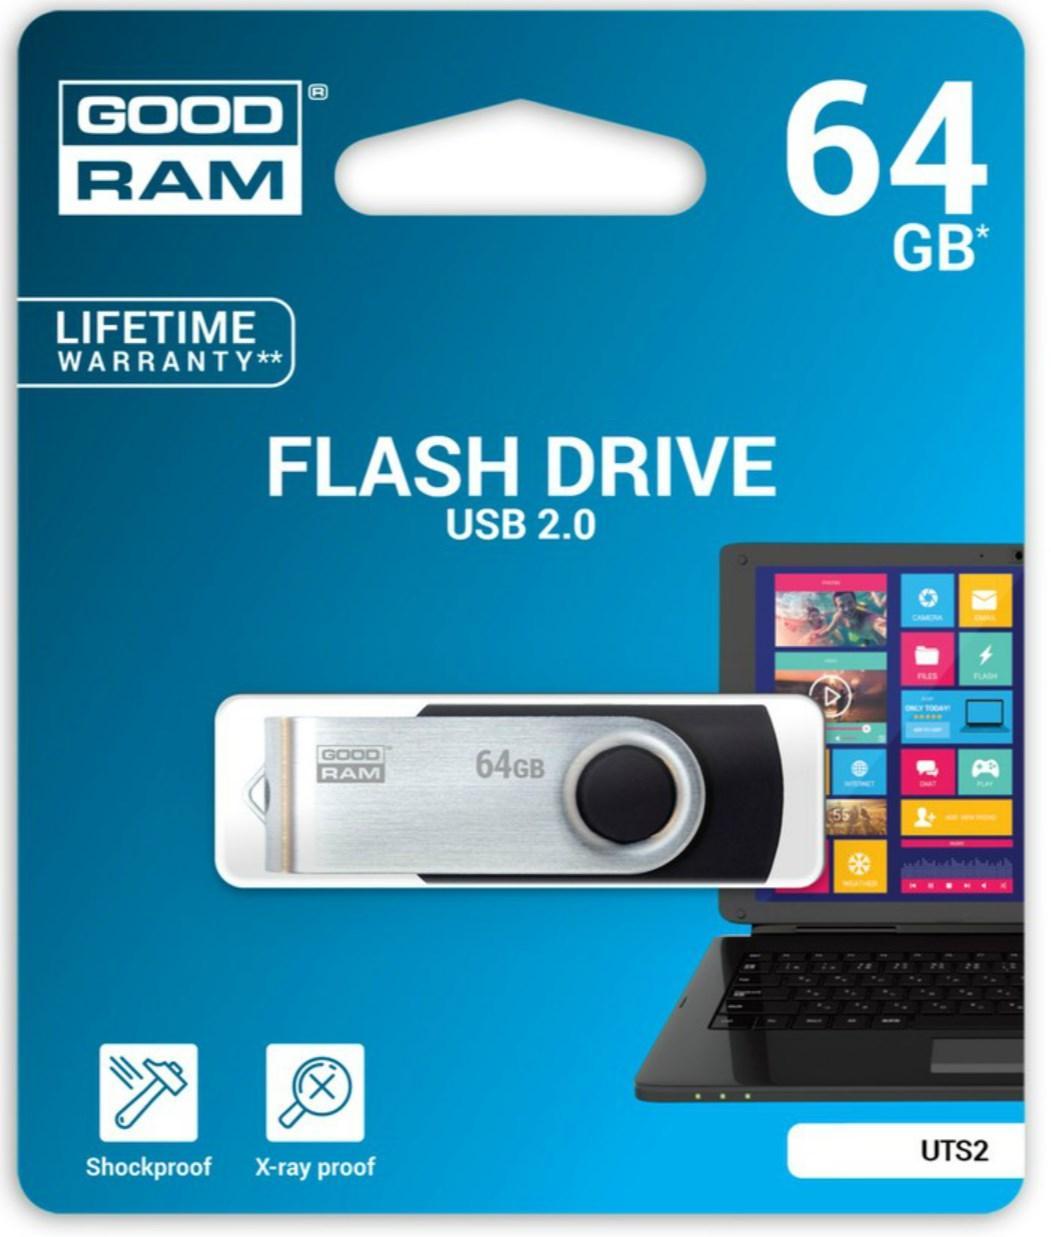 Clé USB 2.0 Goodram UTS2 - 64 Go